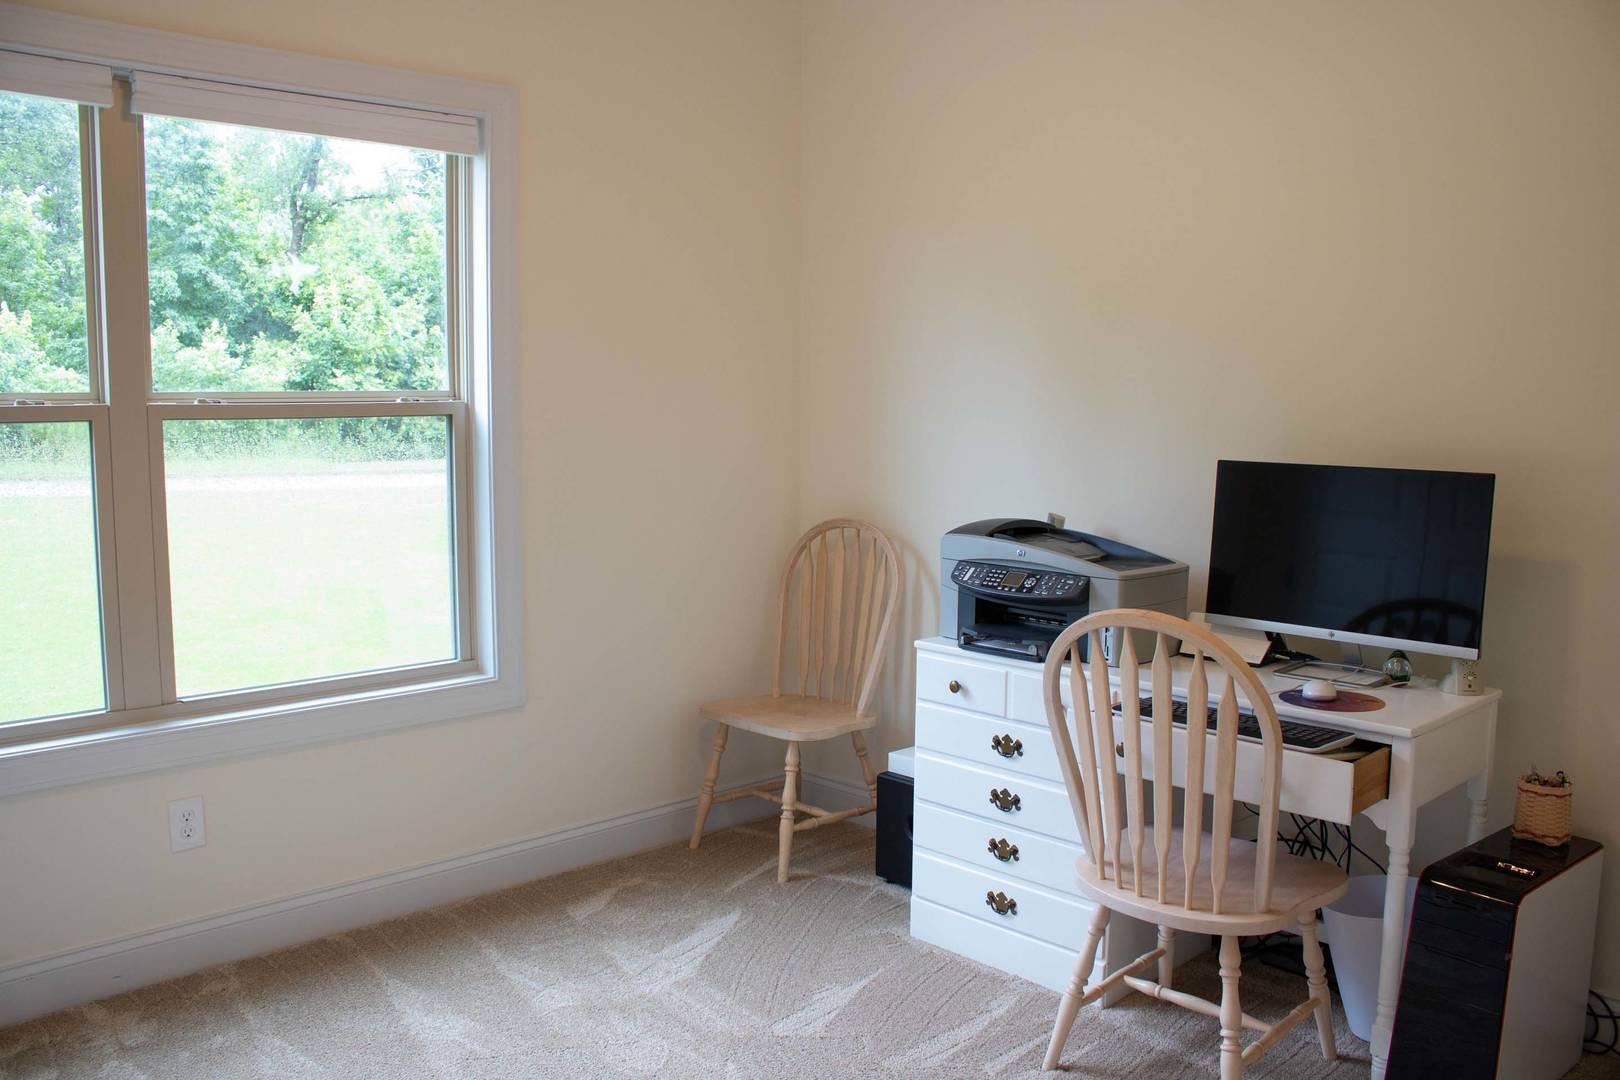 139 Magnolia Farms Drive Milner, GA 30257